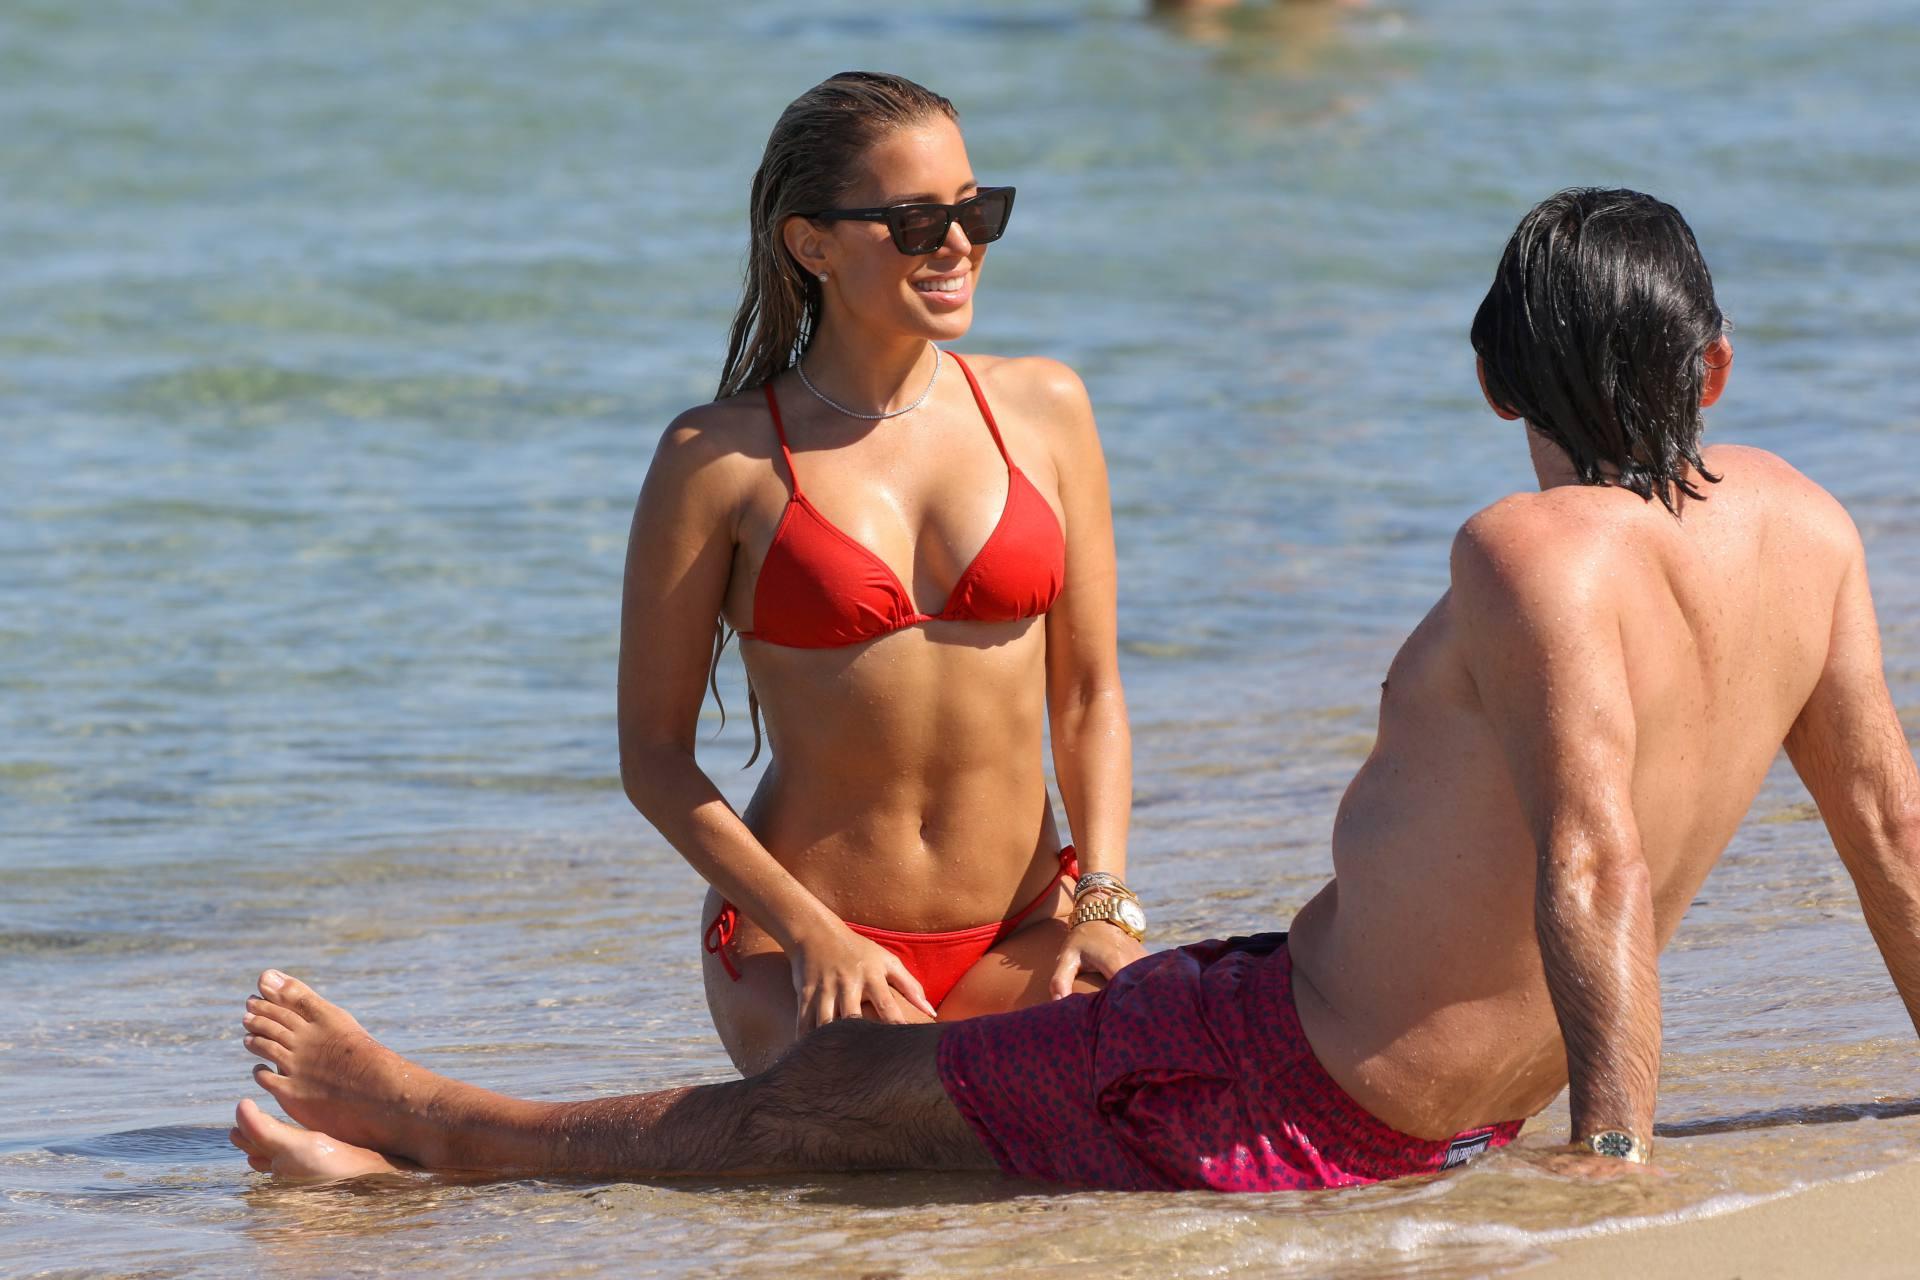 Sylvie Meis – Beautiful Body In Sexy Bikini On The Beach In Saint Tropez 0025